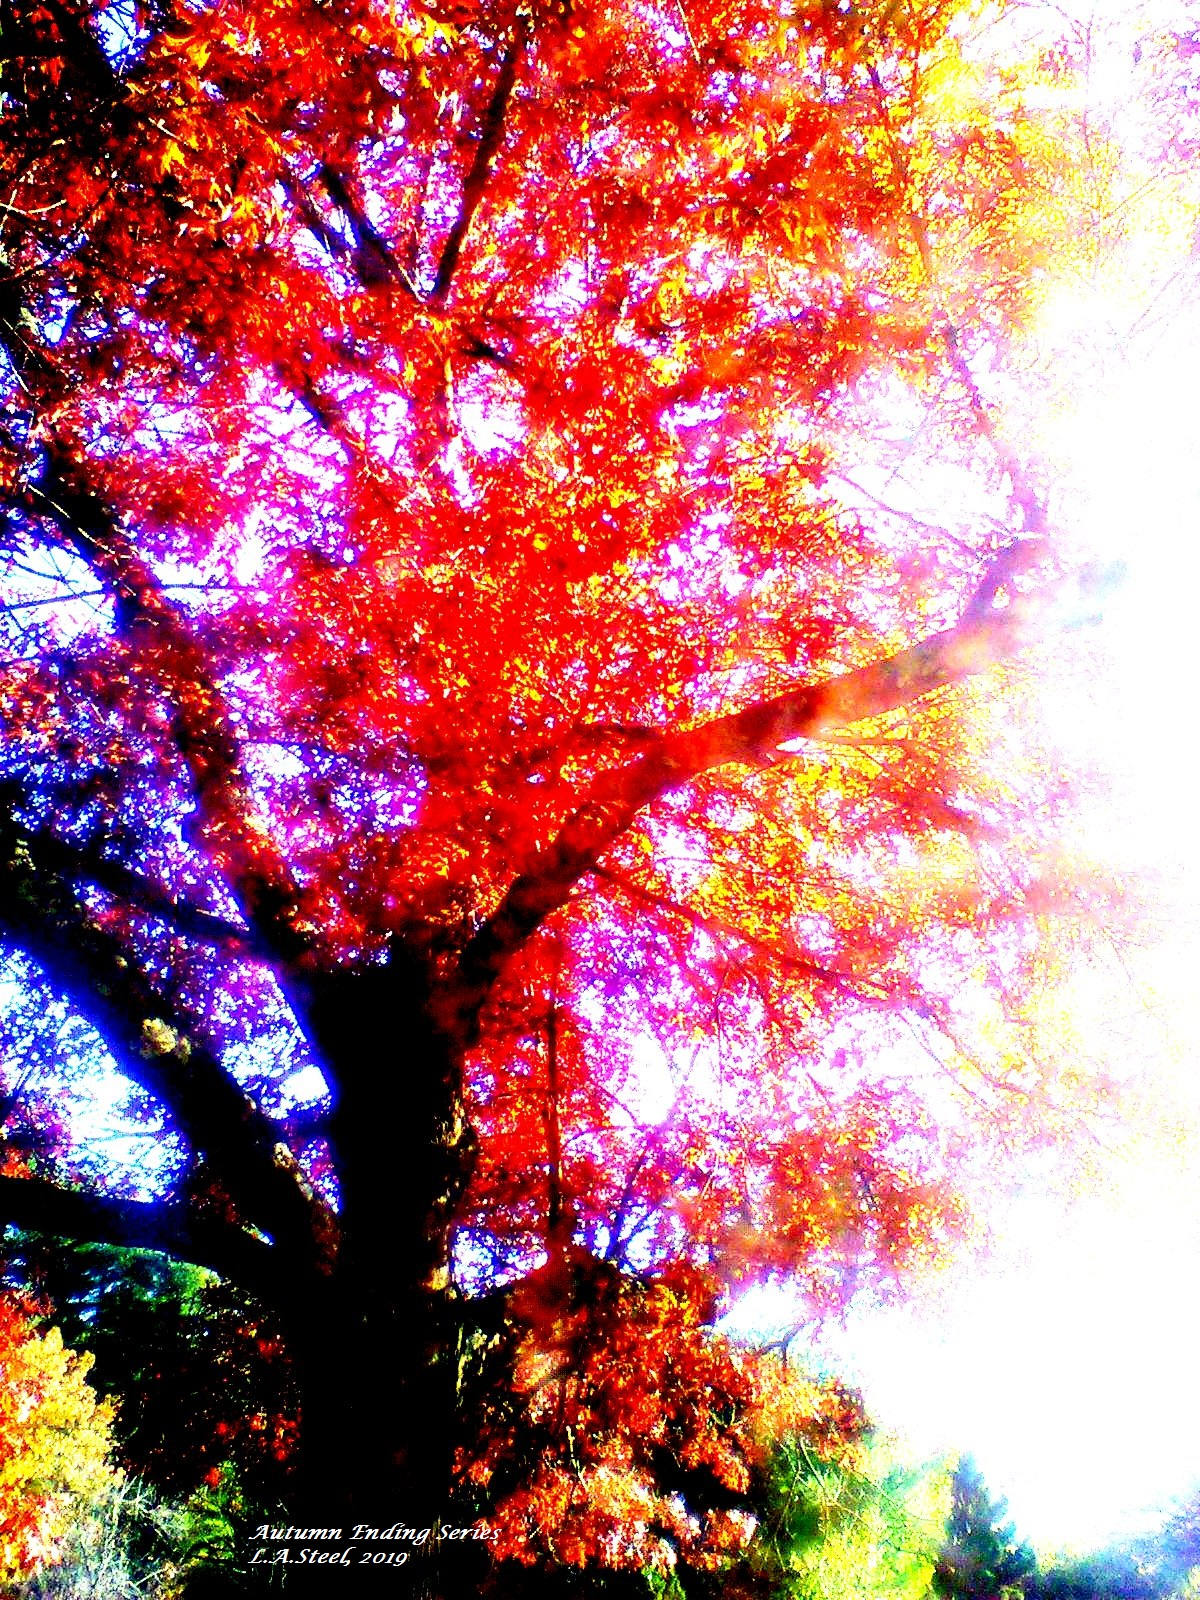 autumn ending 6 2019